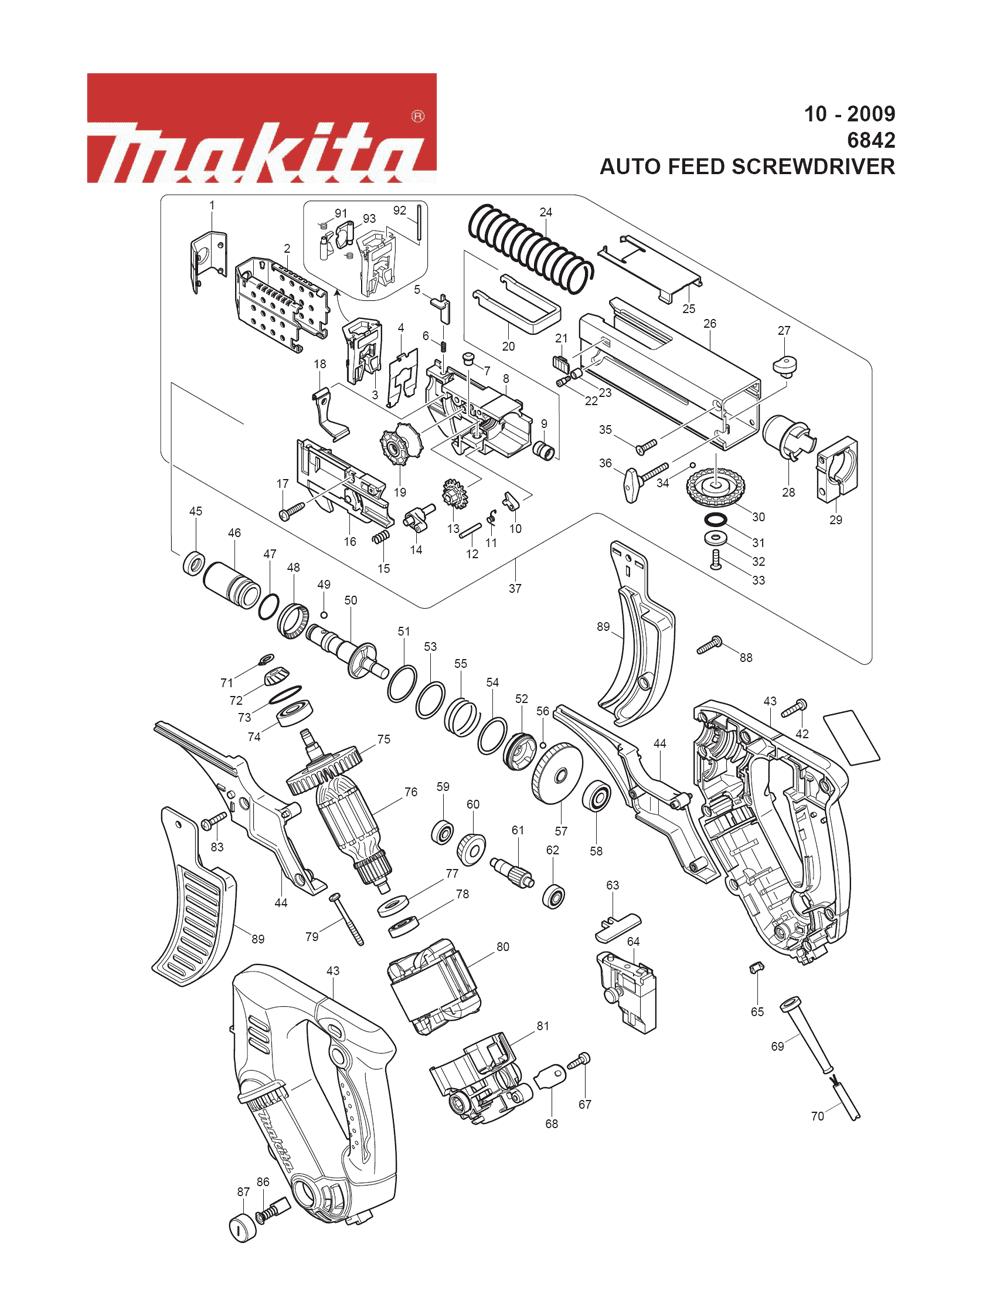 hight resolution of belt sander switch wiring diagram 33 wiring diagram images wiring diagrams gsmx co 460 3 phase